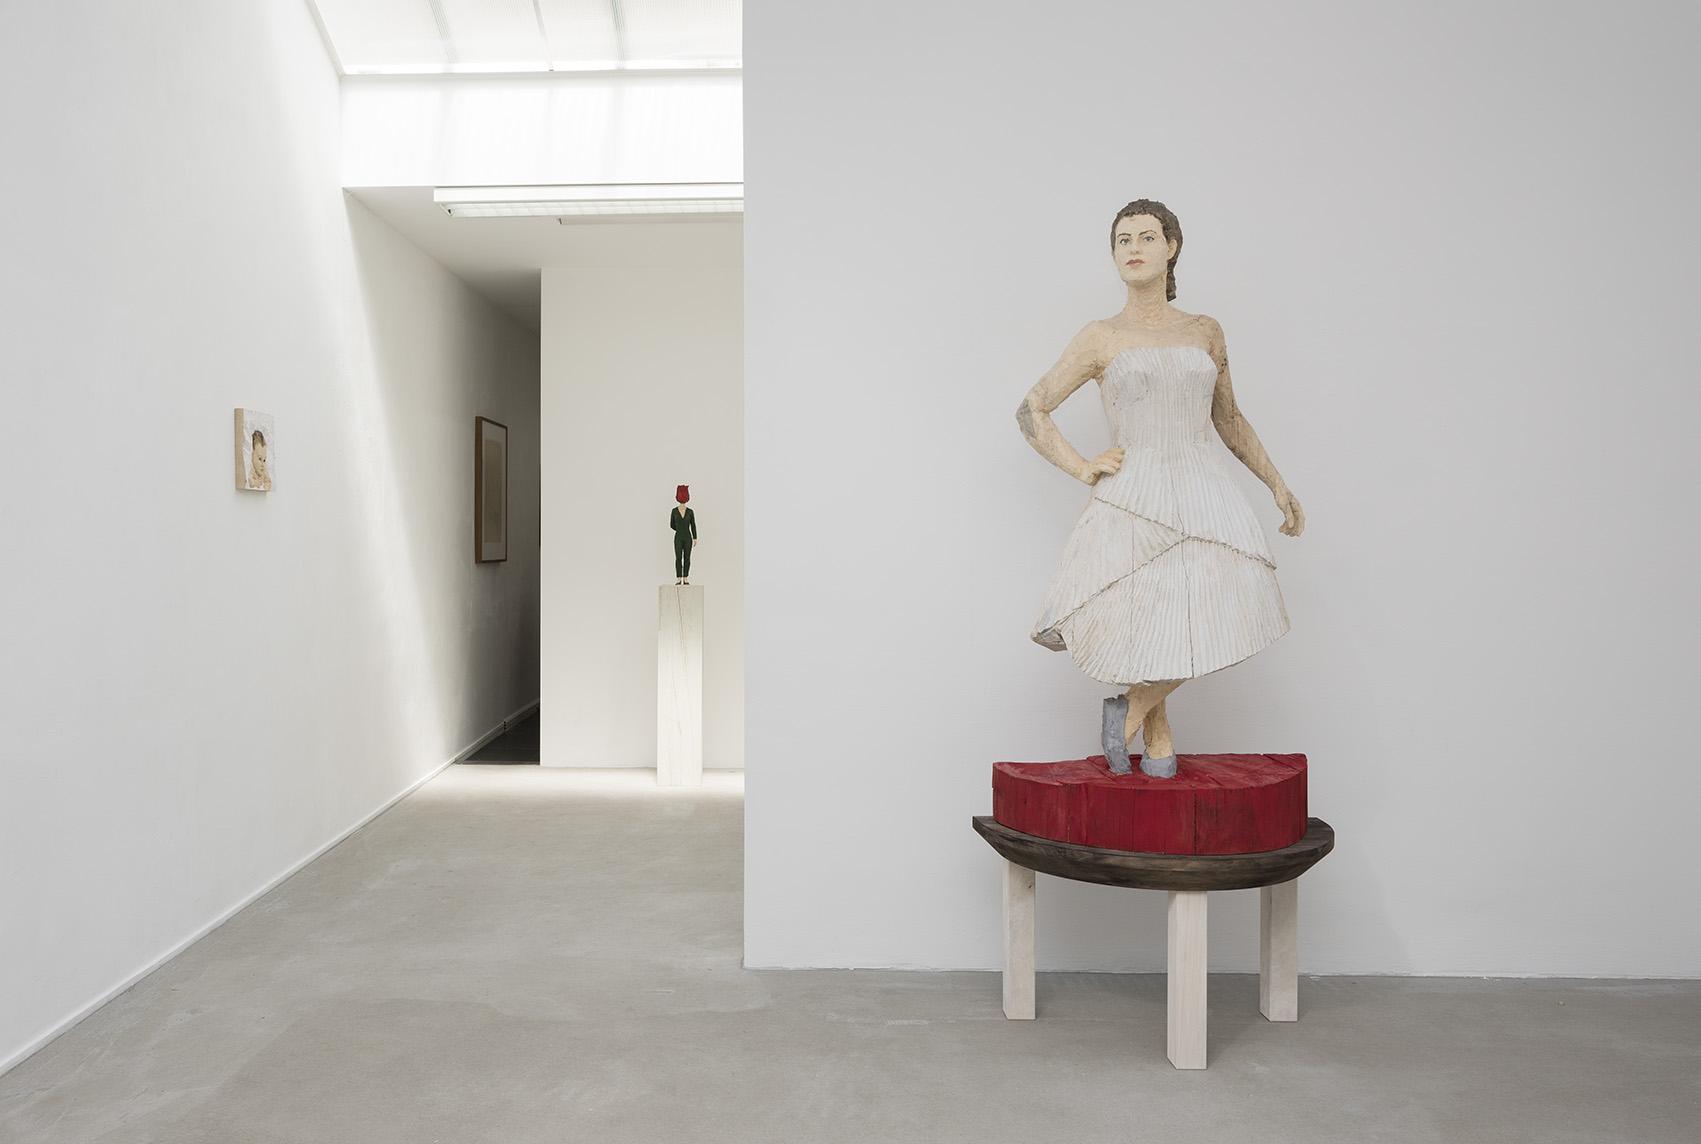 Stephan Balkenhol, installation view II,photo Peter Cox, AKINCI, 2015